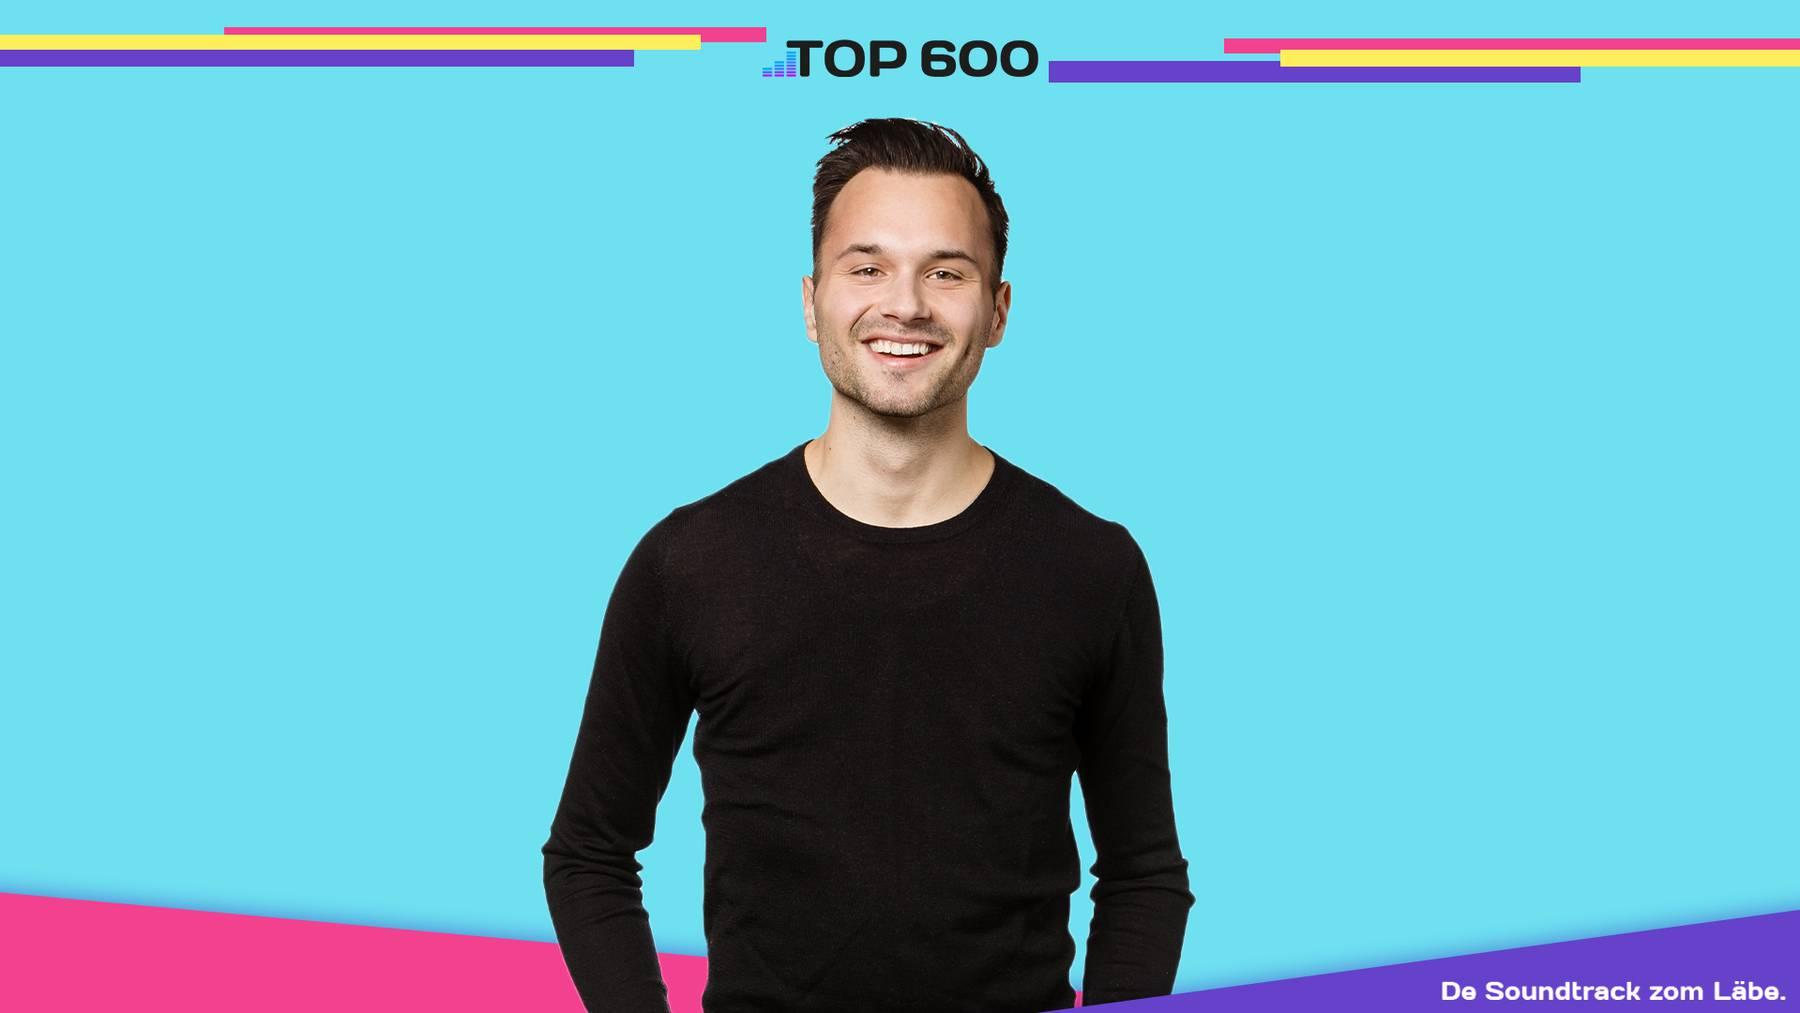 Asset André Top 600